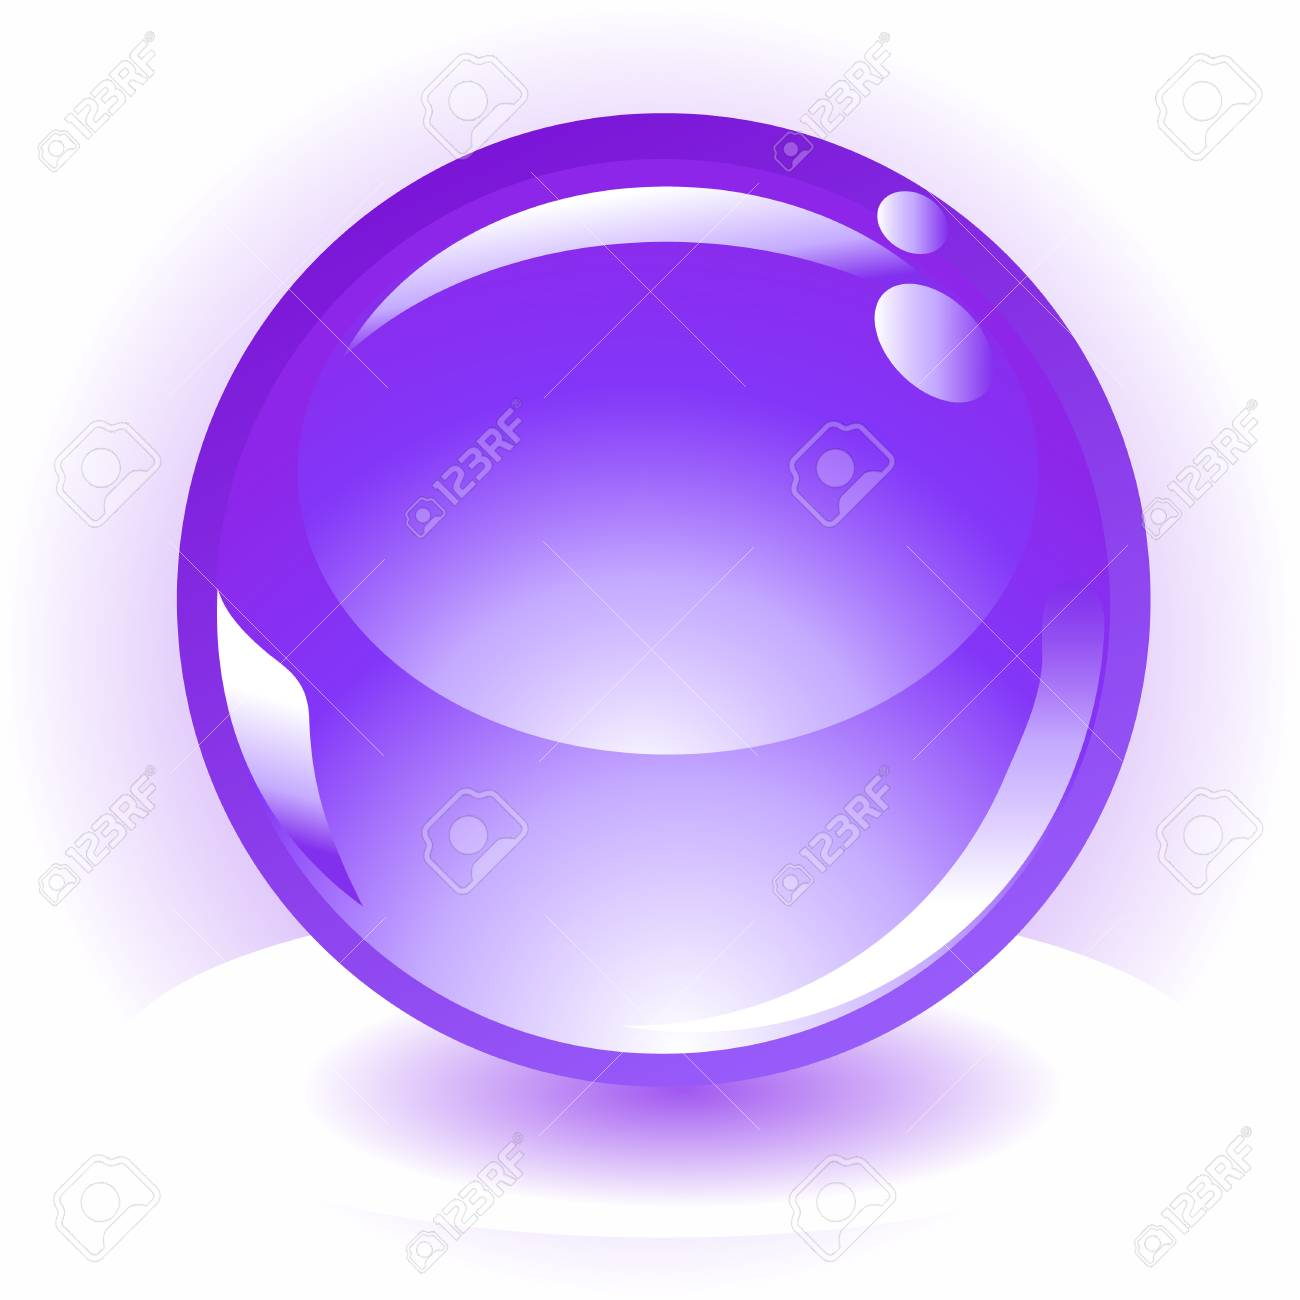 sphere vector icon Stock Vector - 4489189